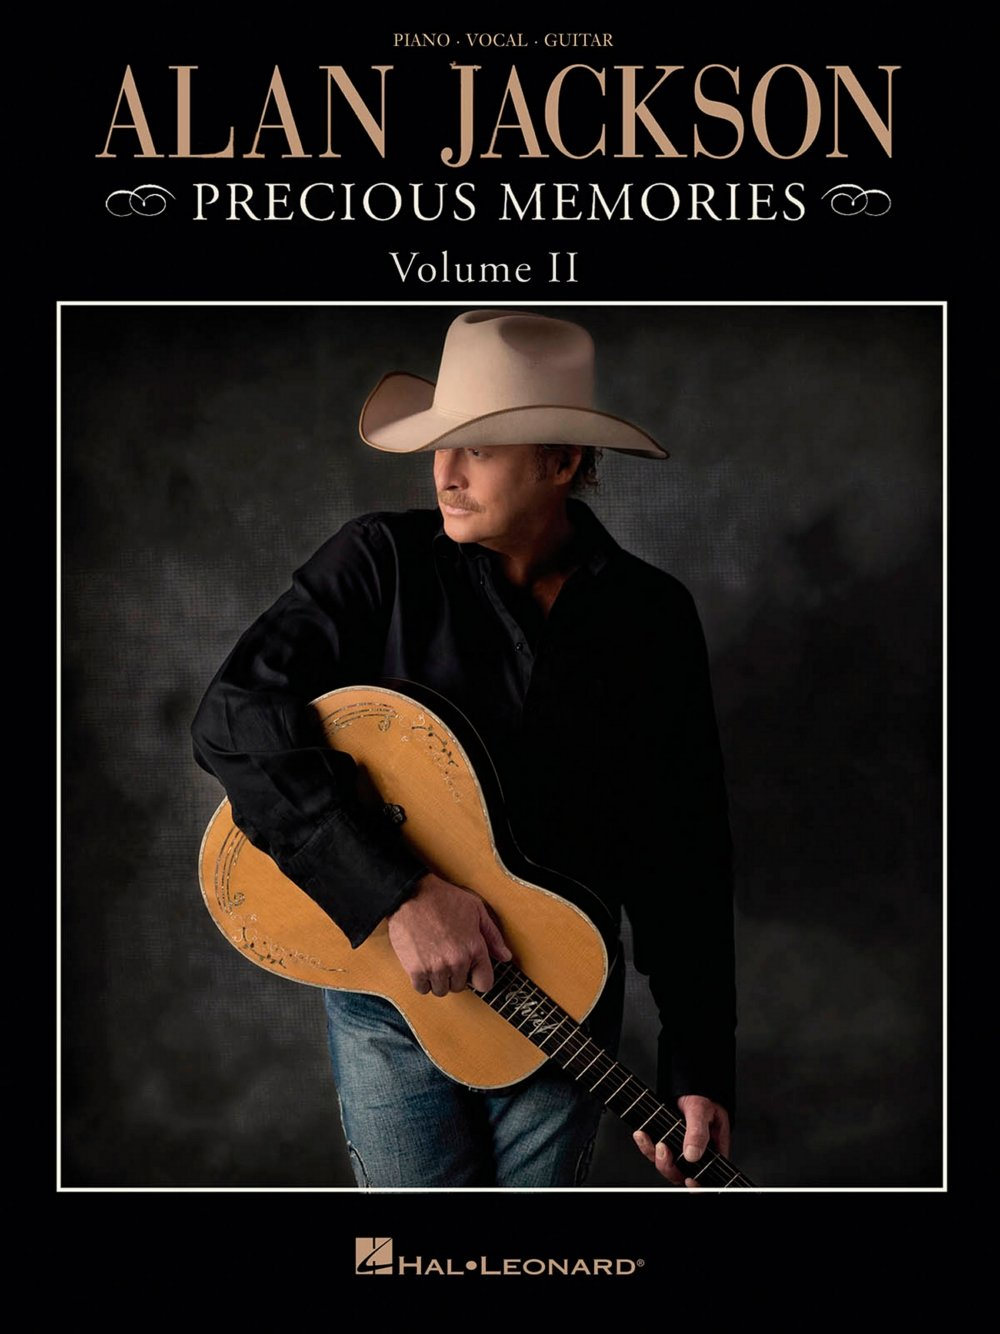 Hal Leonard Alan Jackson Precious Memories Volume 2 For Piano